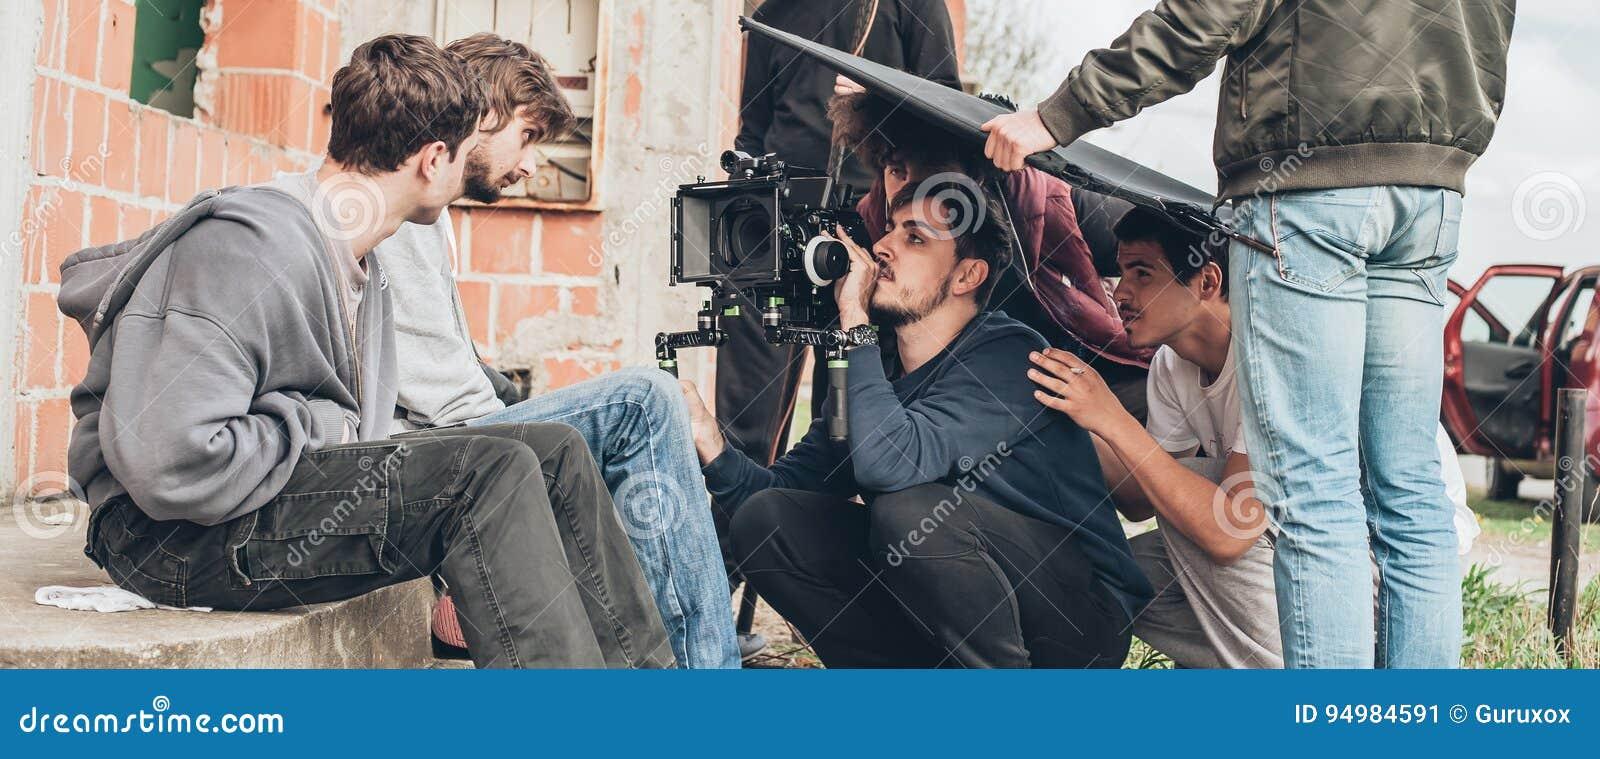 Hinter der Szene Filmteamschmierfilmbildungs-Filmszene im Freien